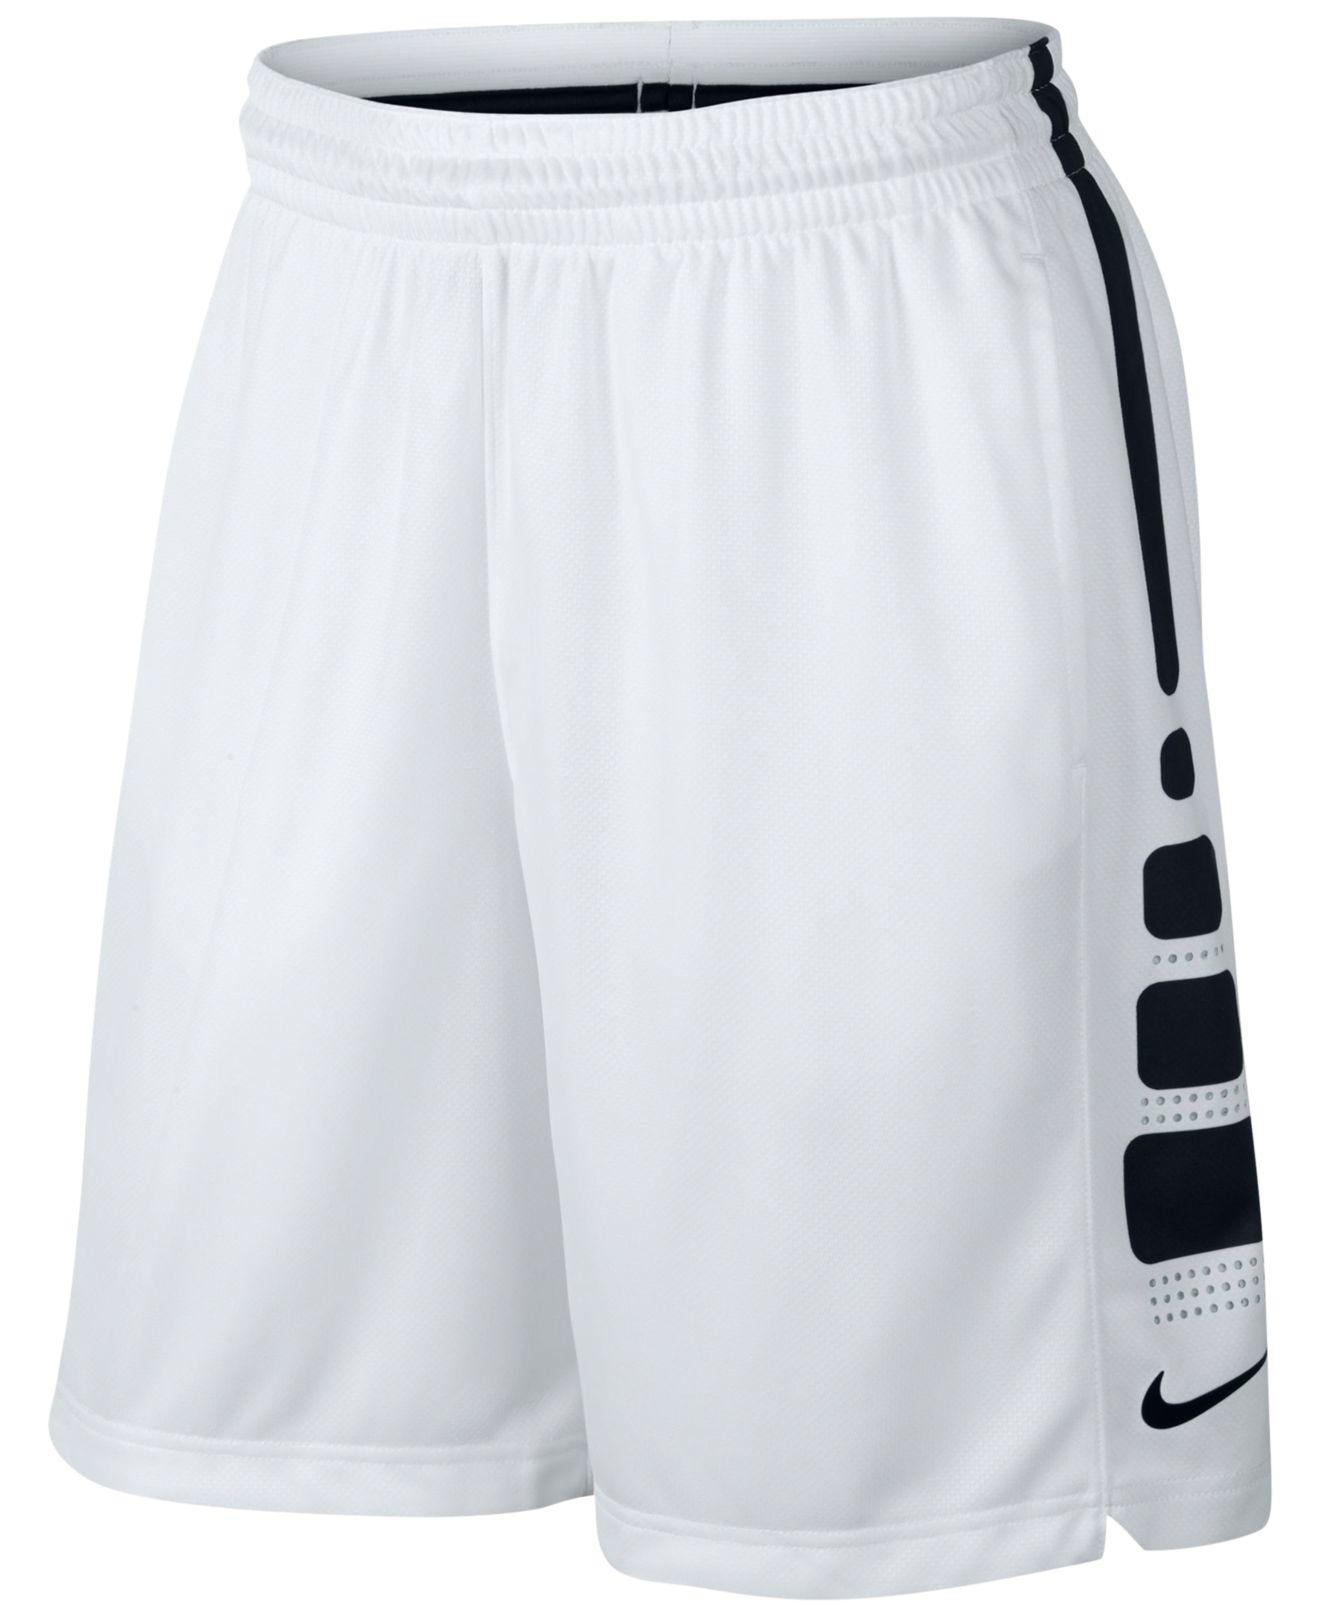 f292783d1365 Nike Elite Dri-fit Basketball Shorts in Black for Men - Lyst